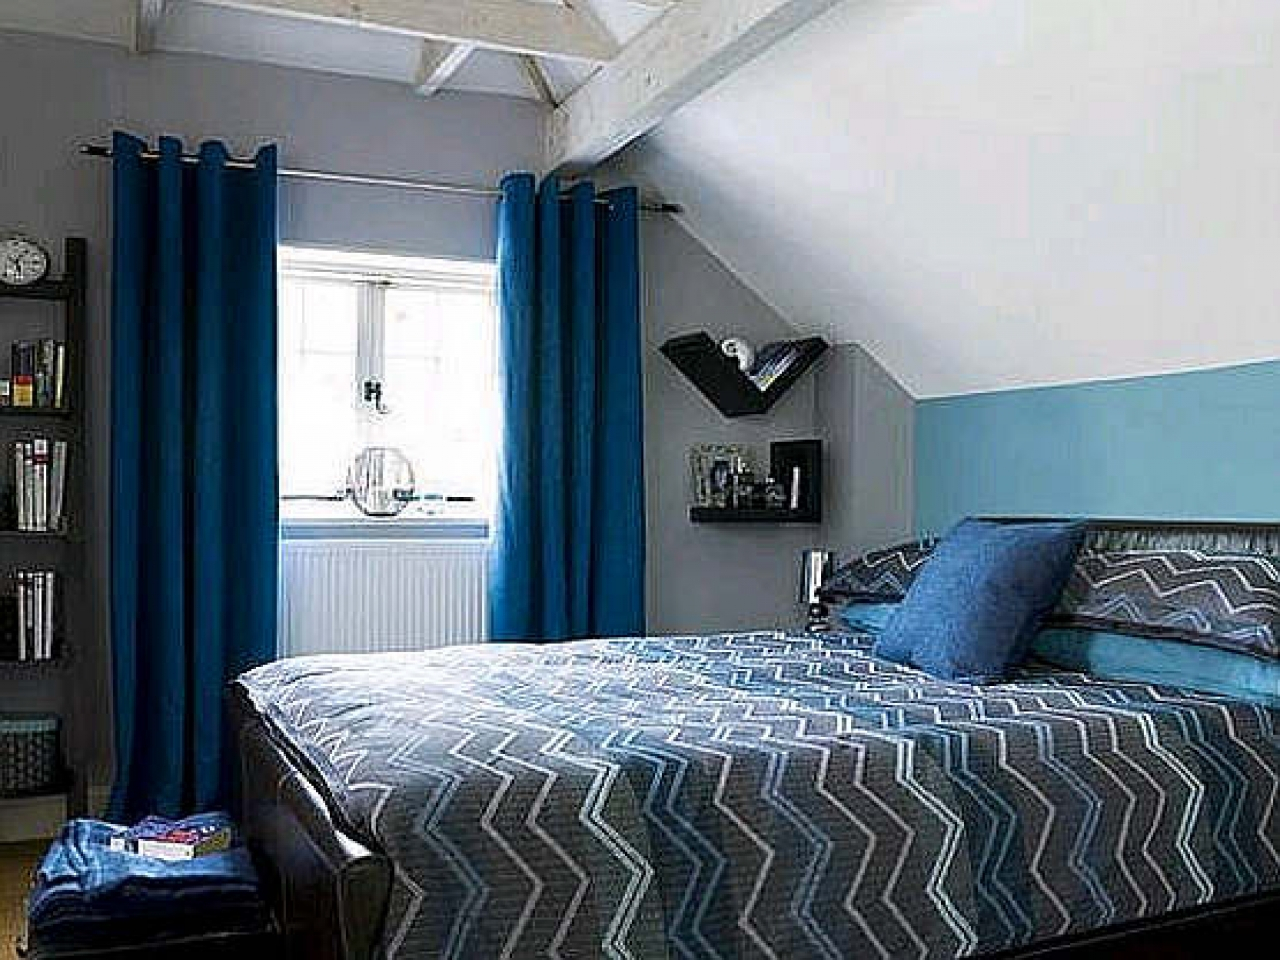 10 Amazing Black And Blue Bedroom Ideas black and blue bedroom ideas blue bedroom interior design best dark 2020